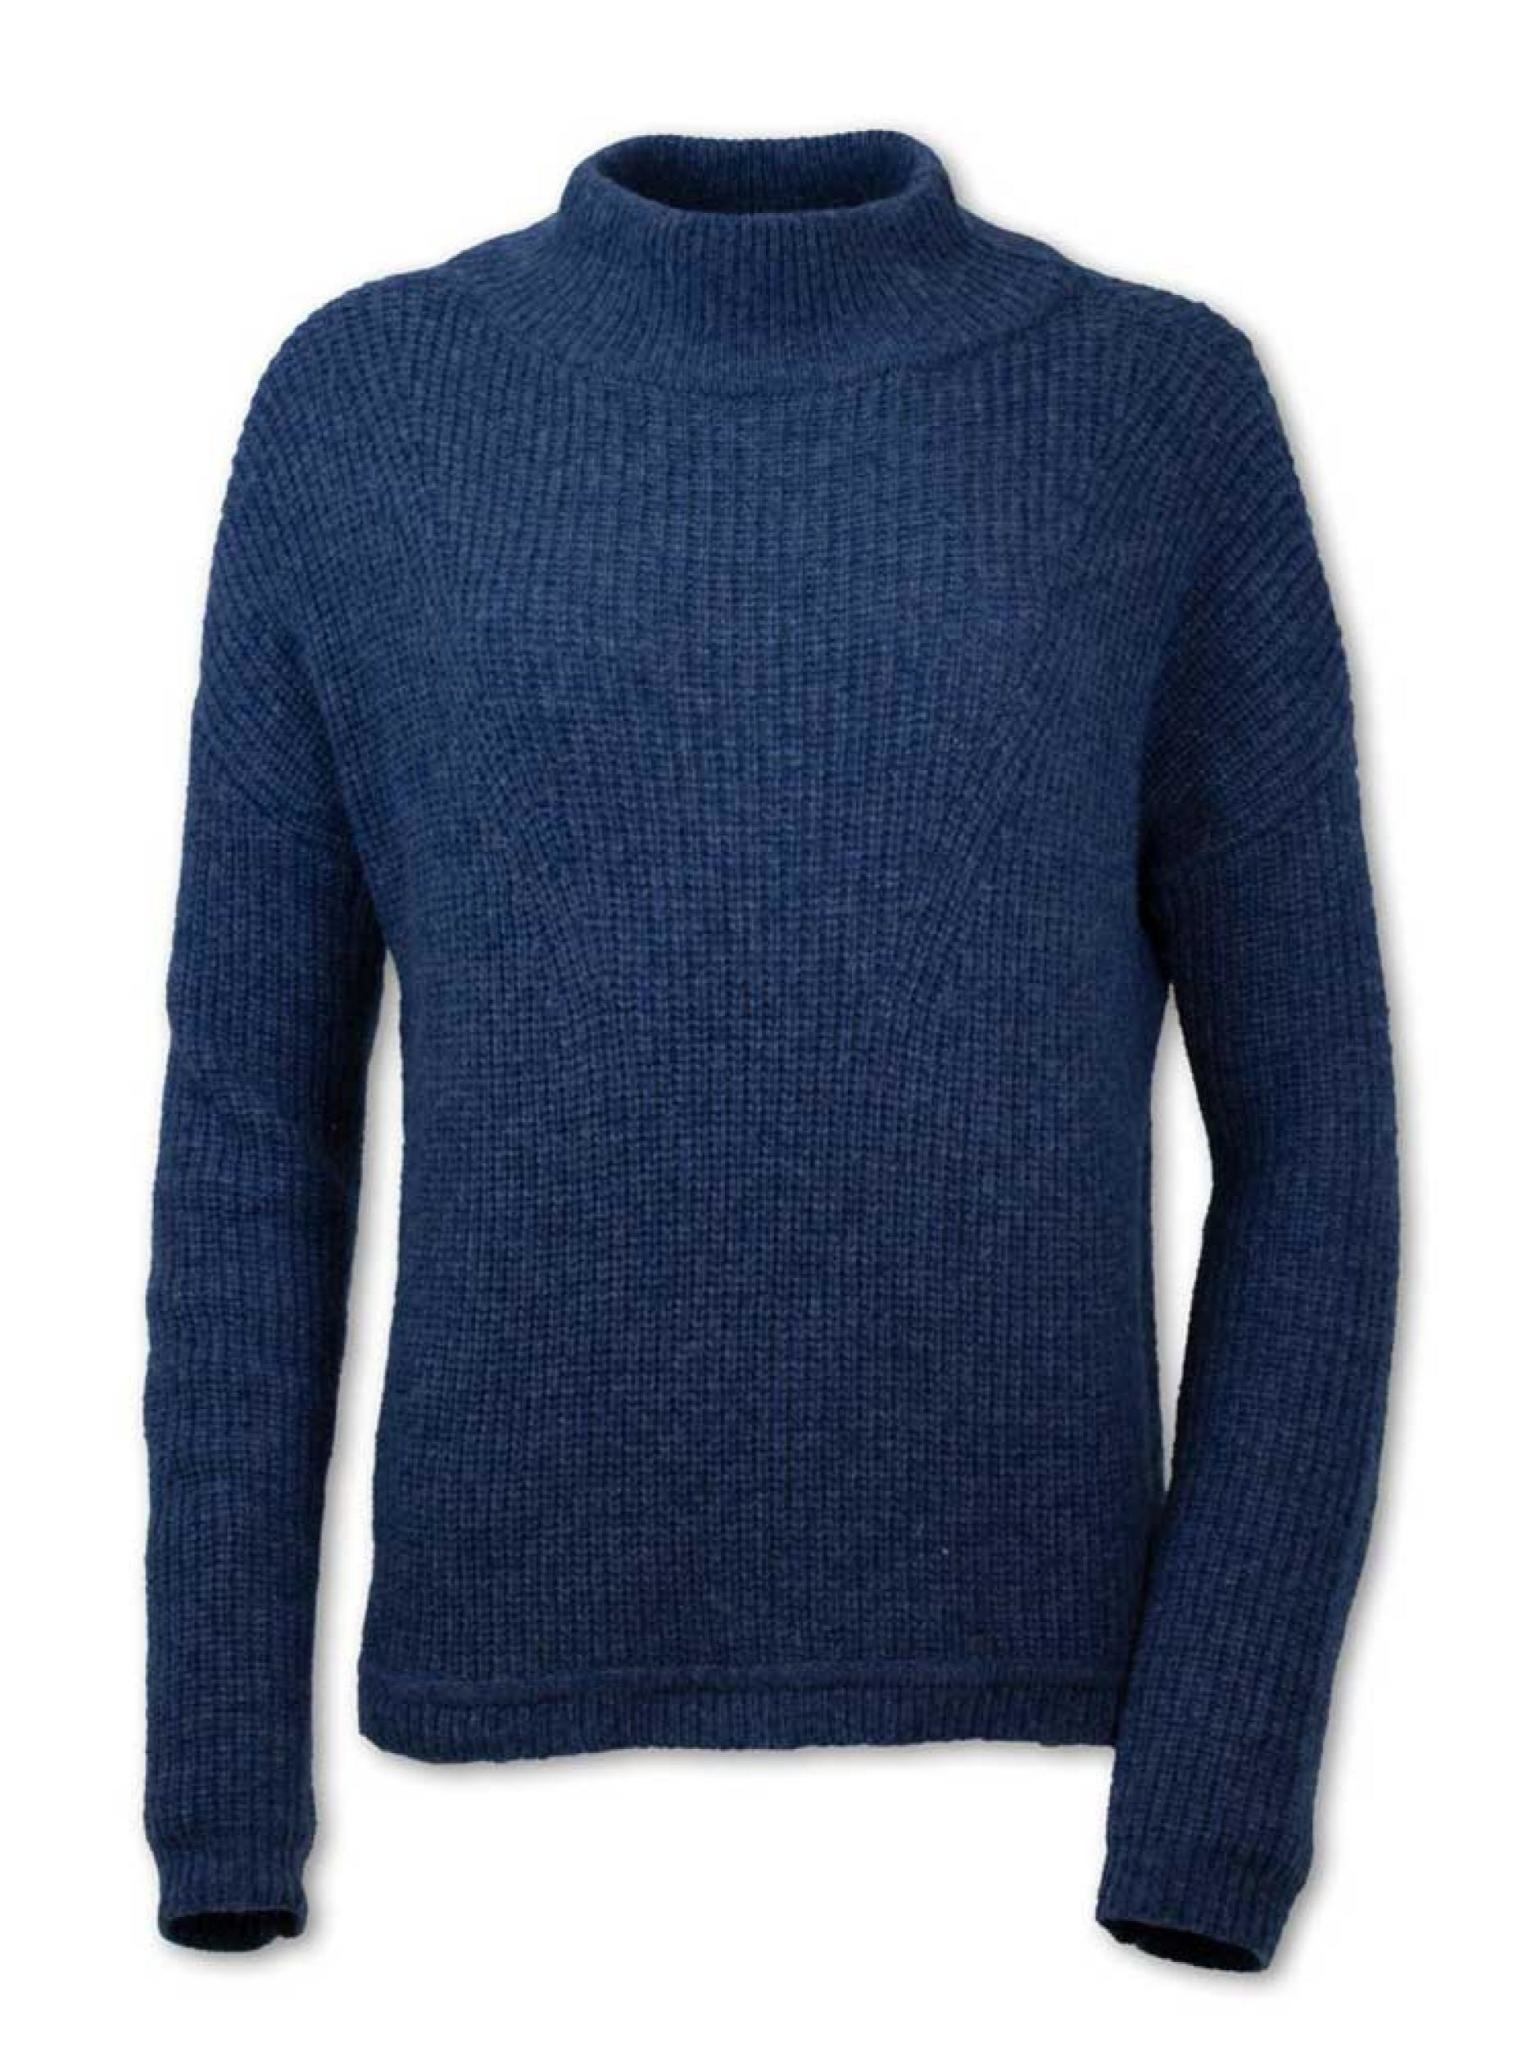 Purnell Women's Wool Blend Cowl Neck Sweater